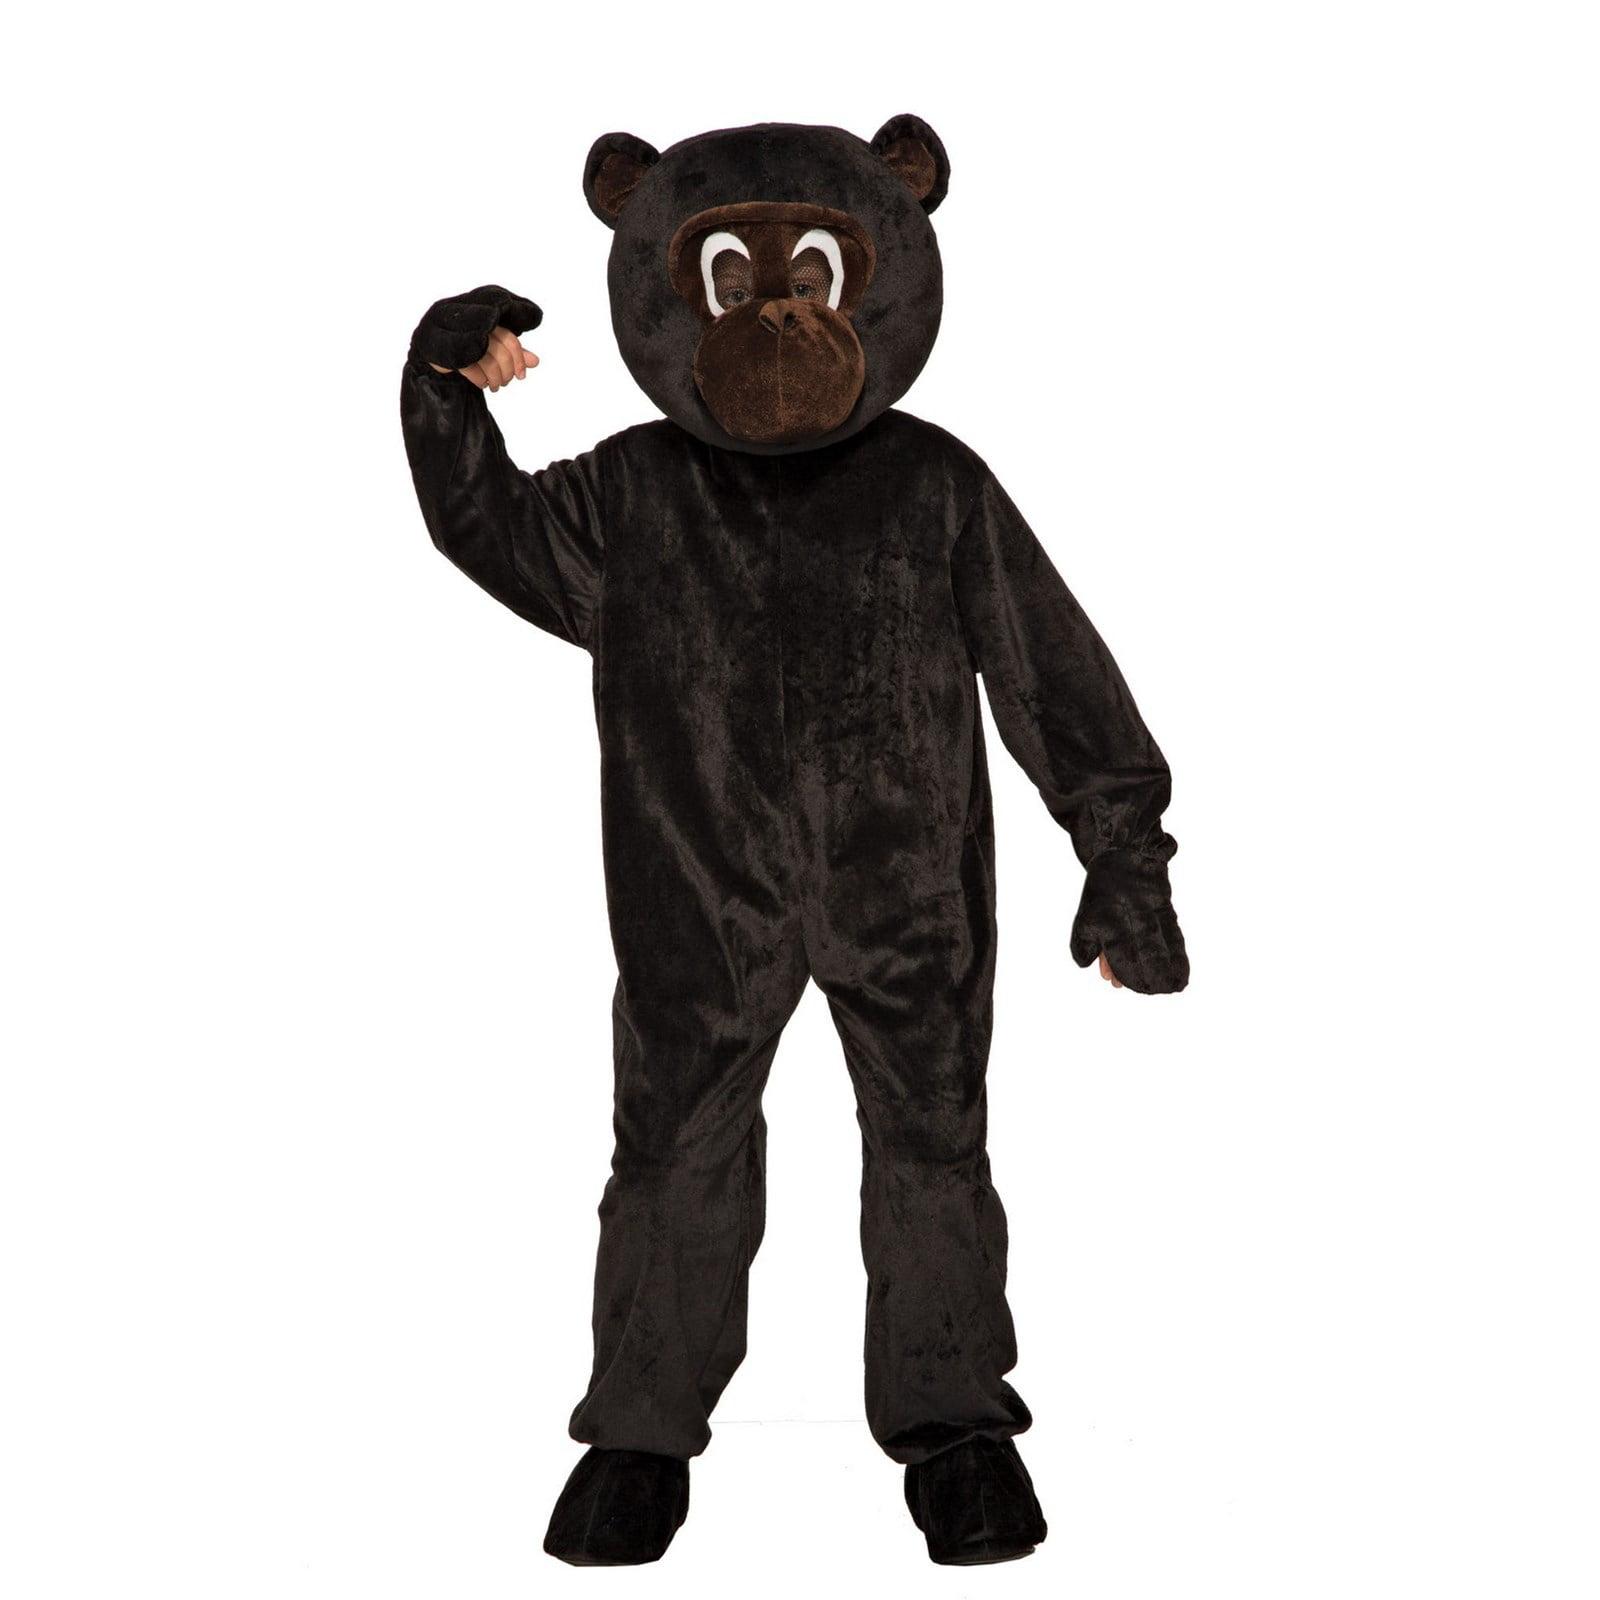 Monkey Child Hooded Zoo Circus Animal Costume Cape Cloak Mantle